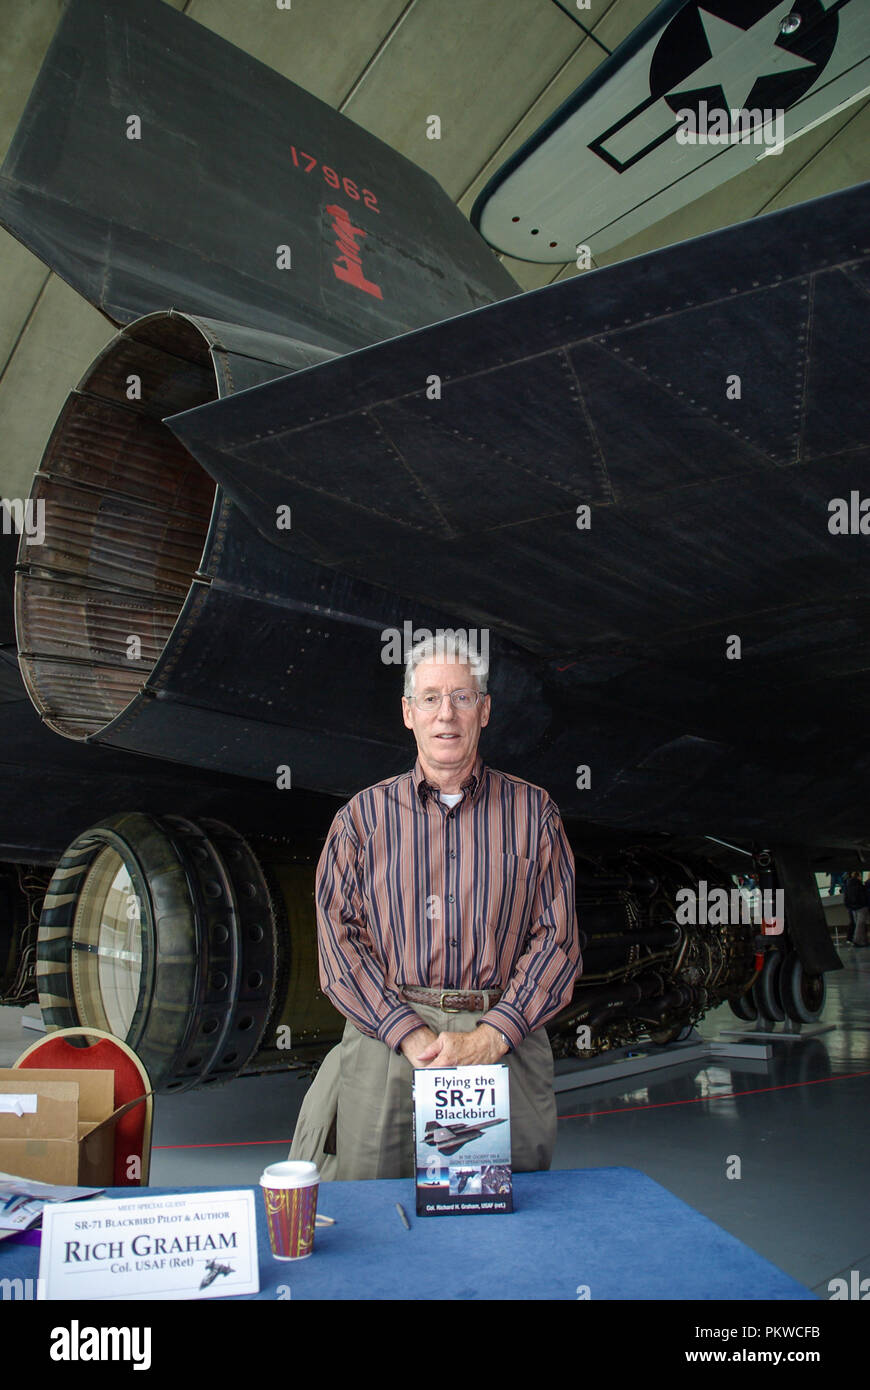 Rich Graham pilot of Lockheed SR-71 Blackbird spyplane jet, behind him. Colonel Richard Graham USAF United States Air Force. Book author on SR-71 - Stock Image